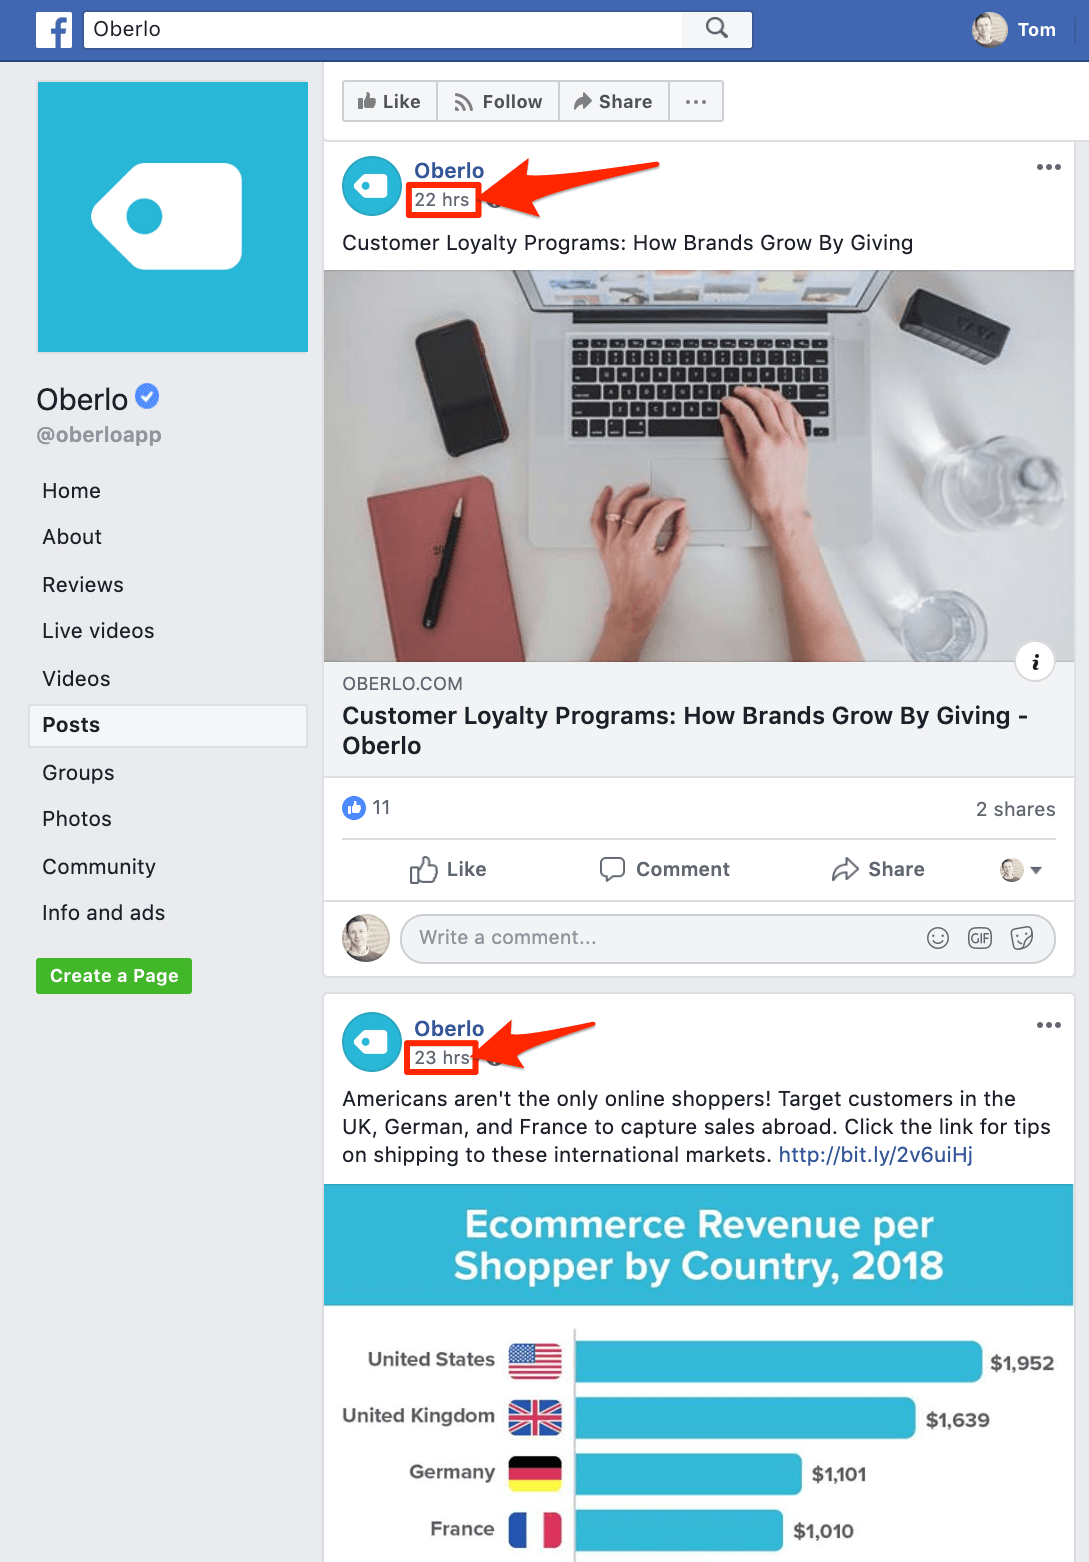 Oberlo Social Media Marketing